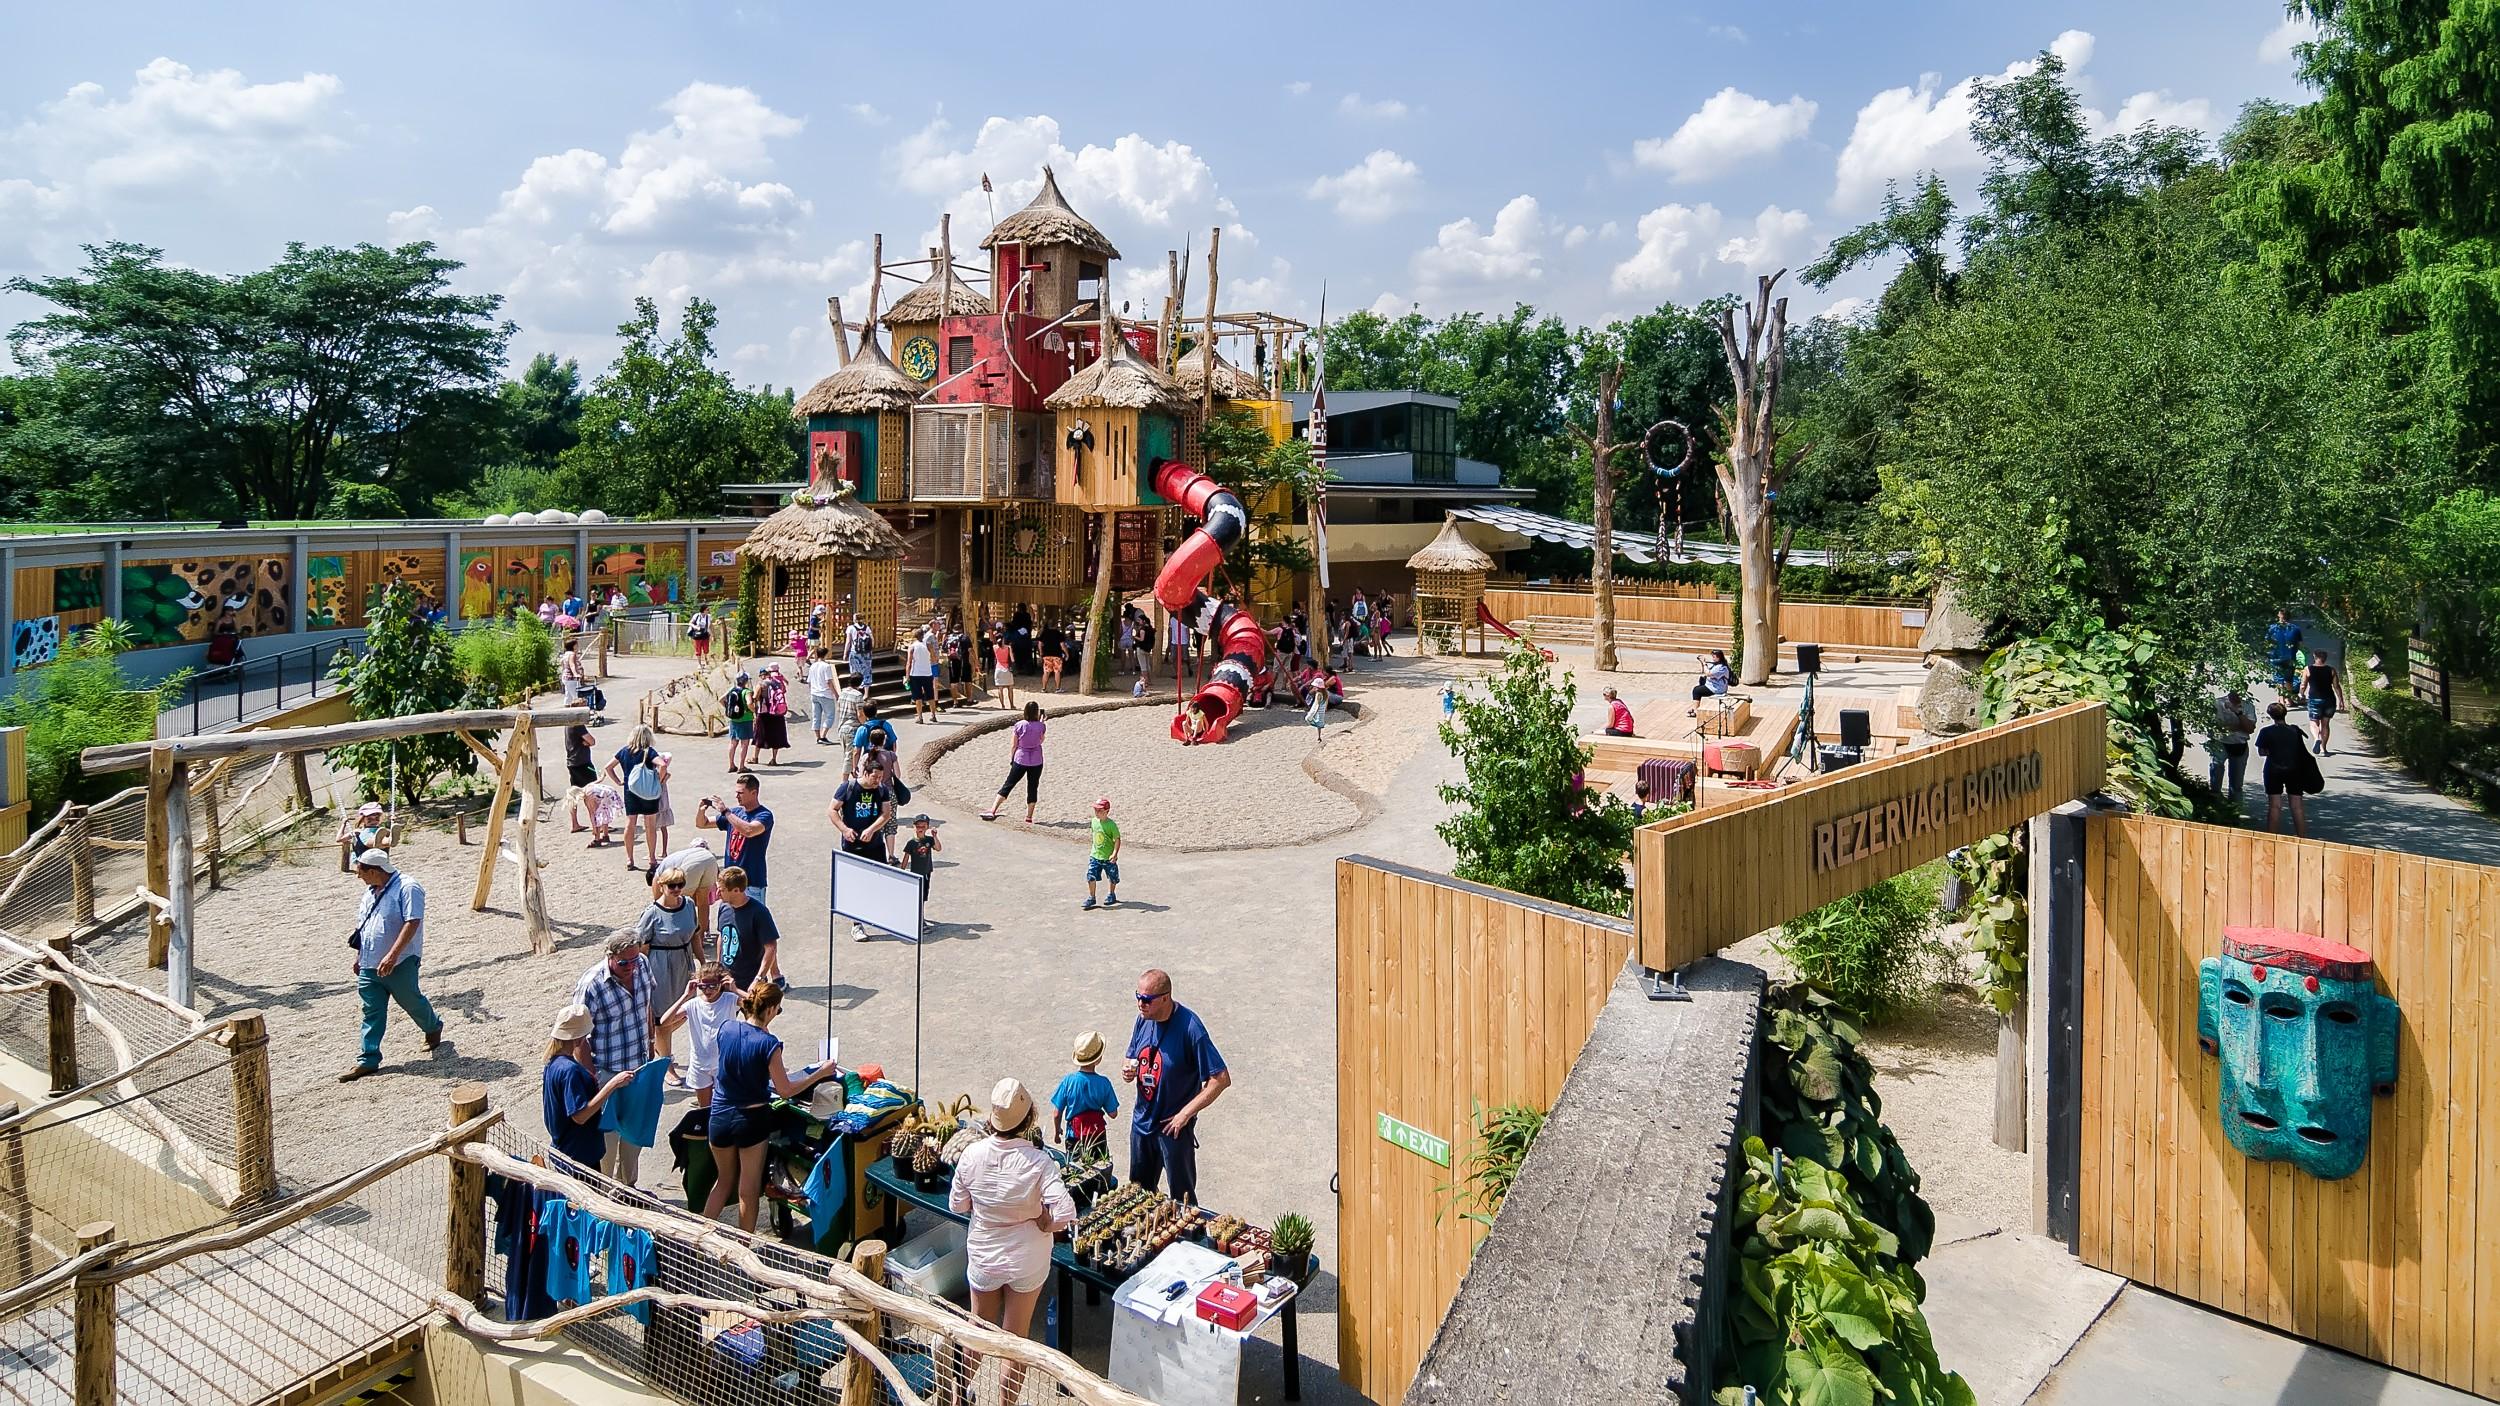 Bororo reserve prague zoo for Designhotel elephant prague 1 czech republic